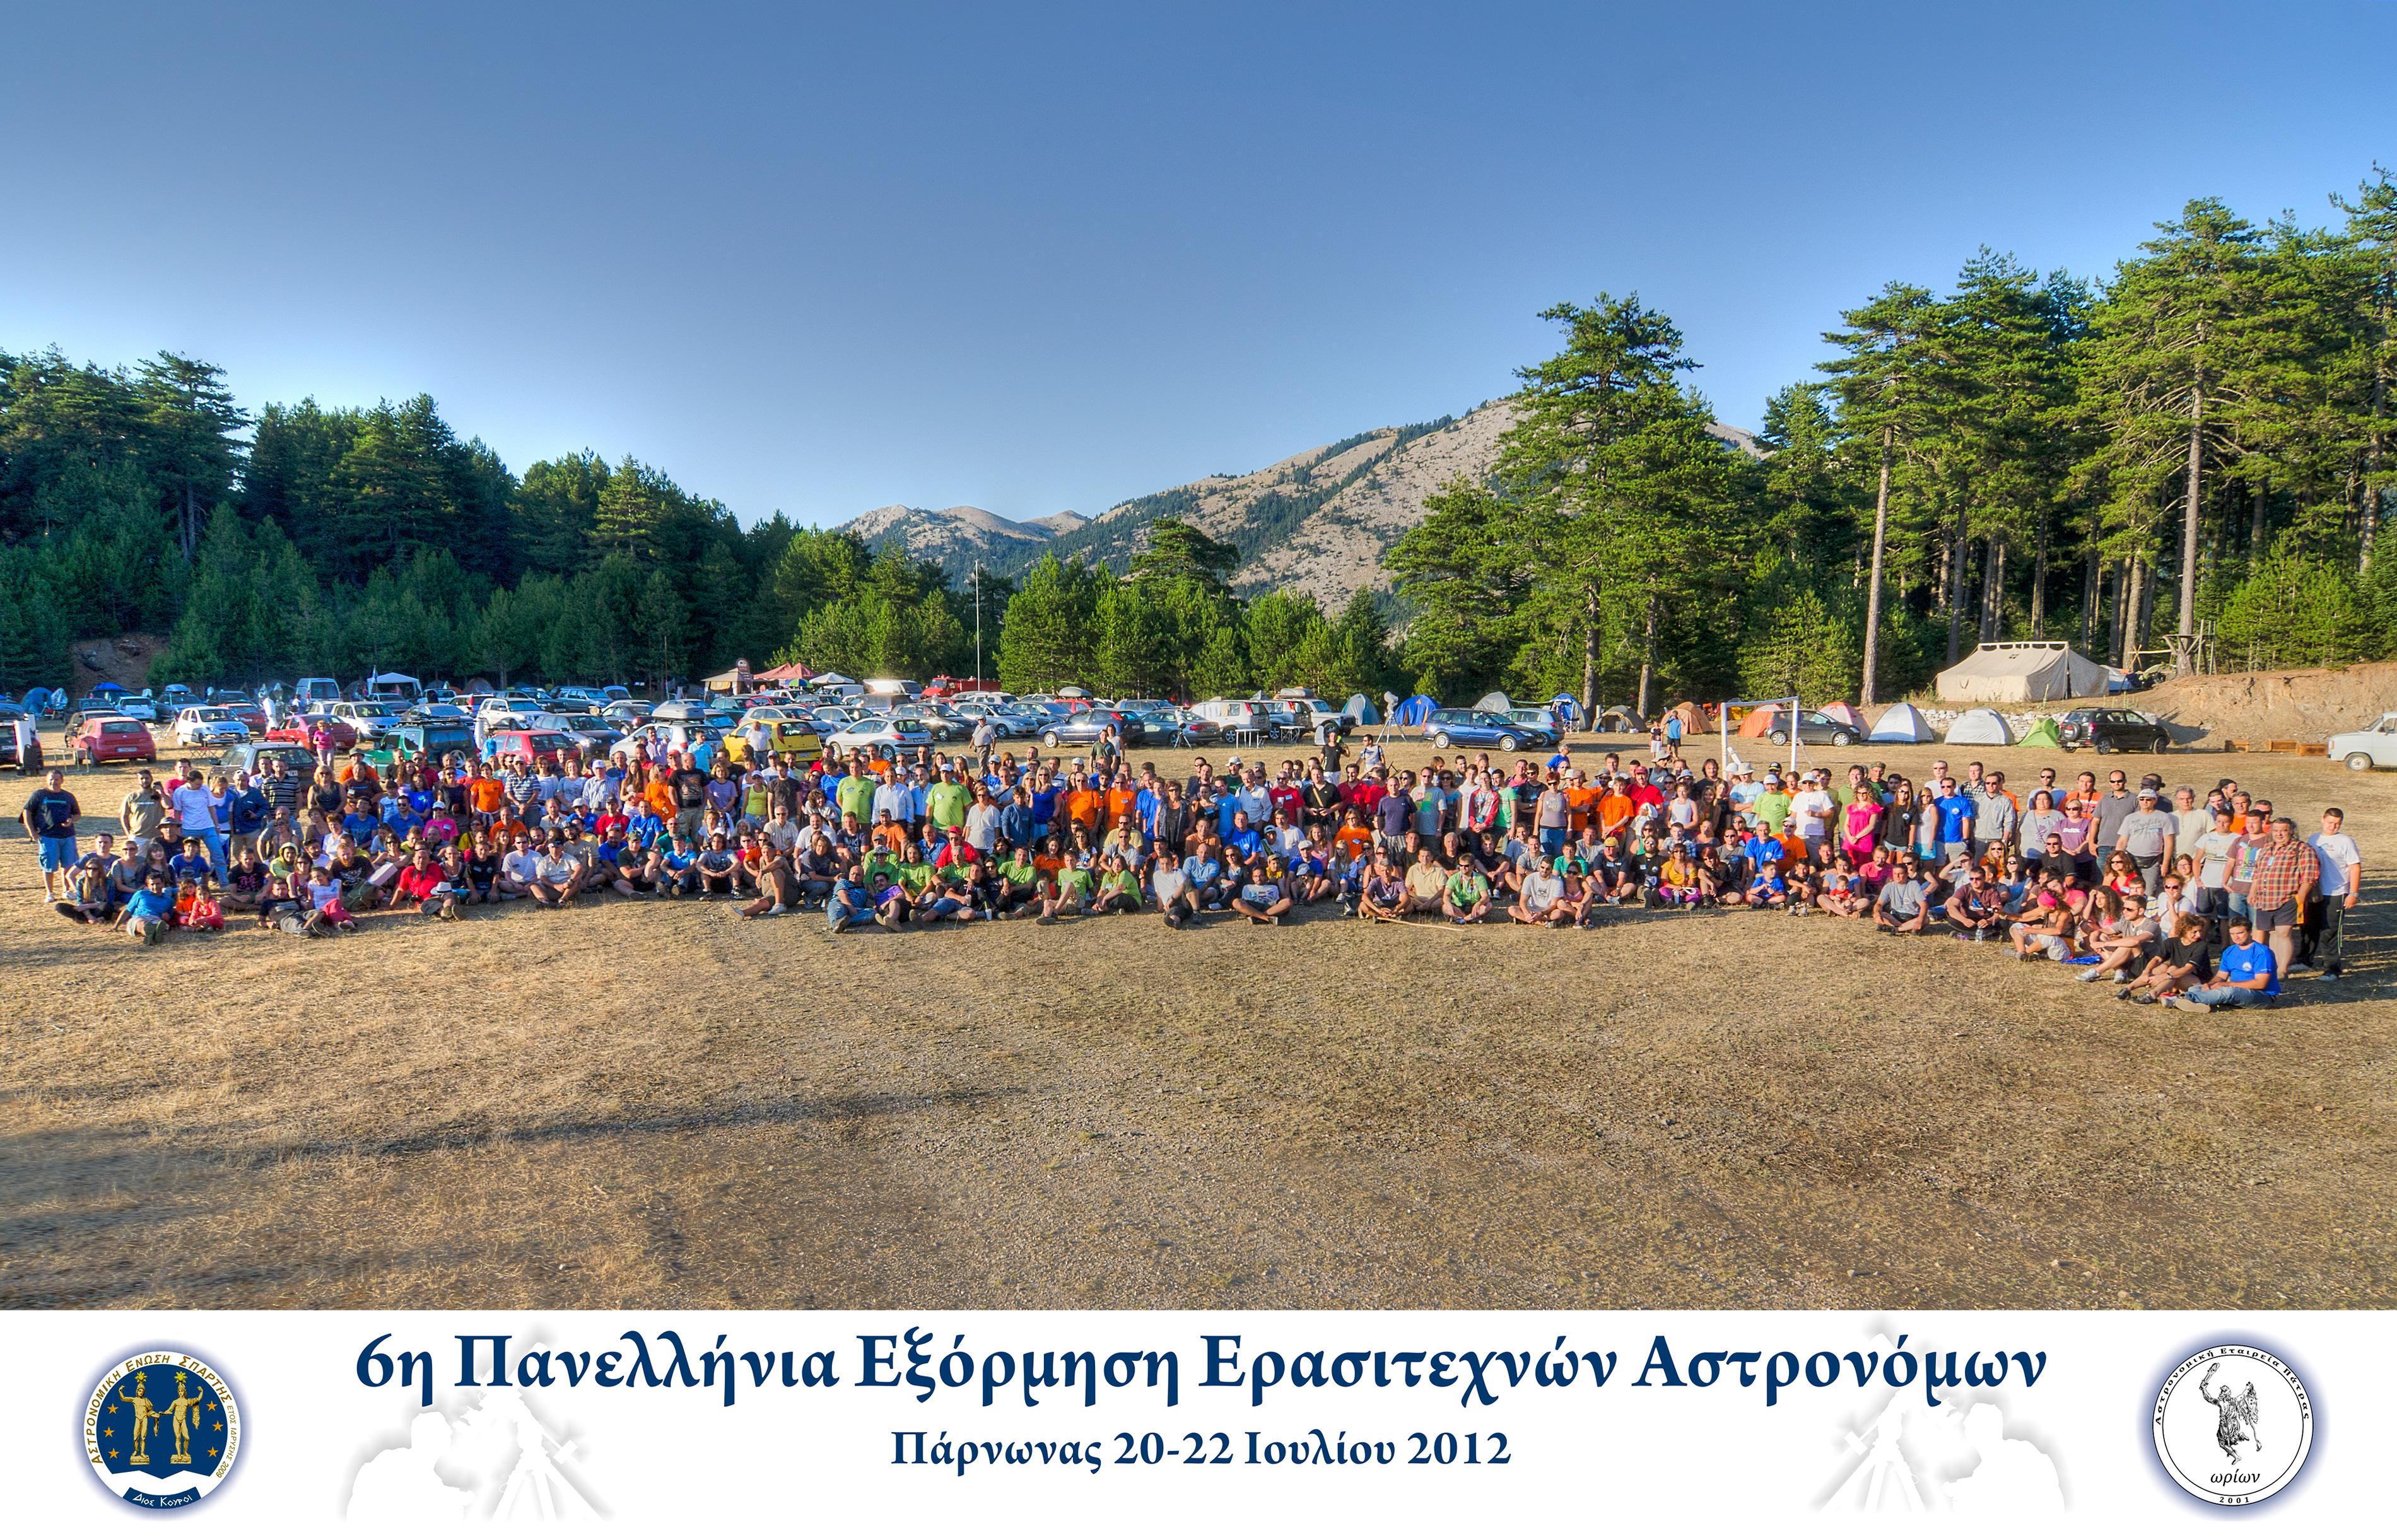 http://www.astroexormisi2012.gr/memories/albums/userpics/10003/6peea-omadikh.jpg